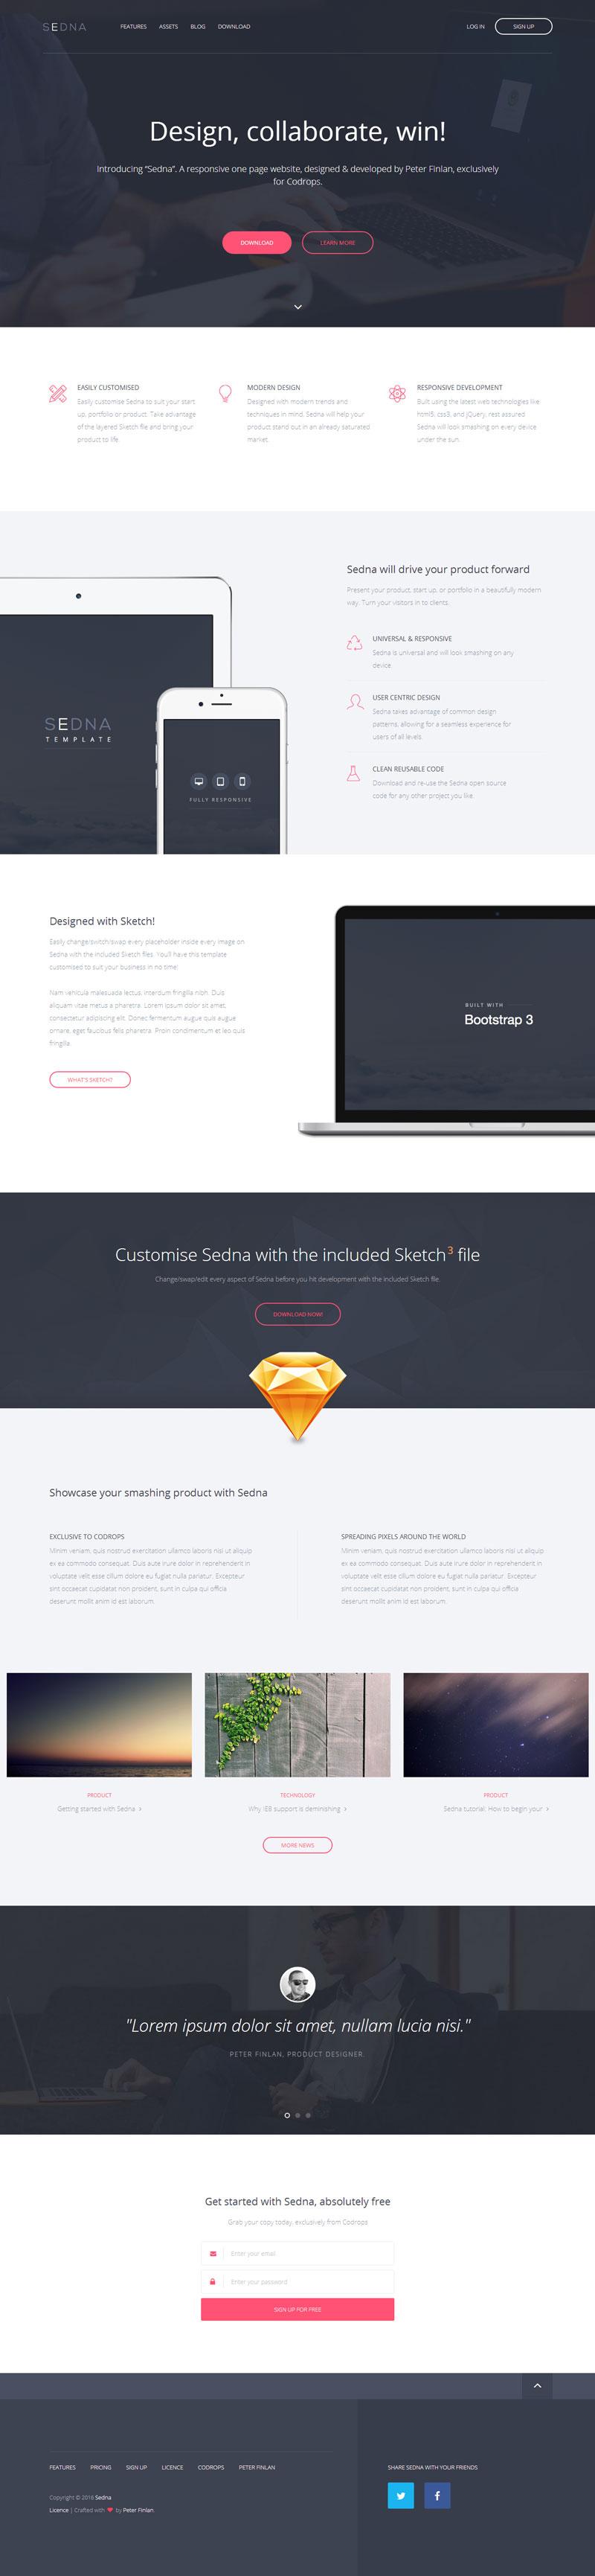 html5响应式扁平化公司企业网站单页模板